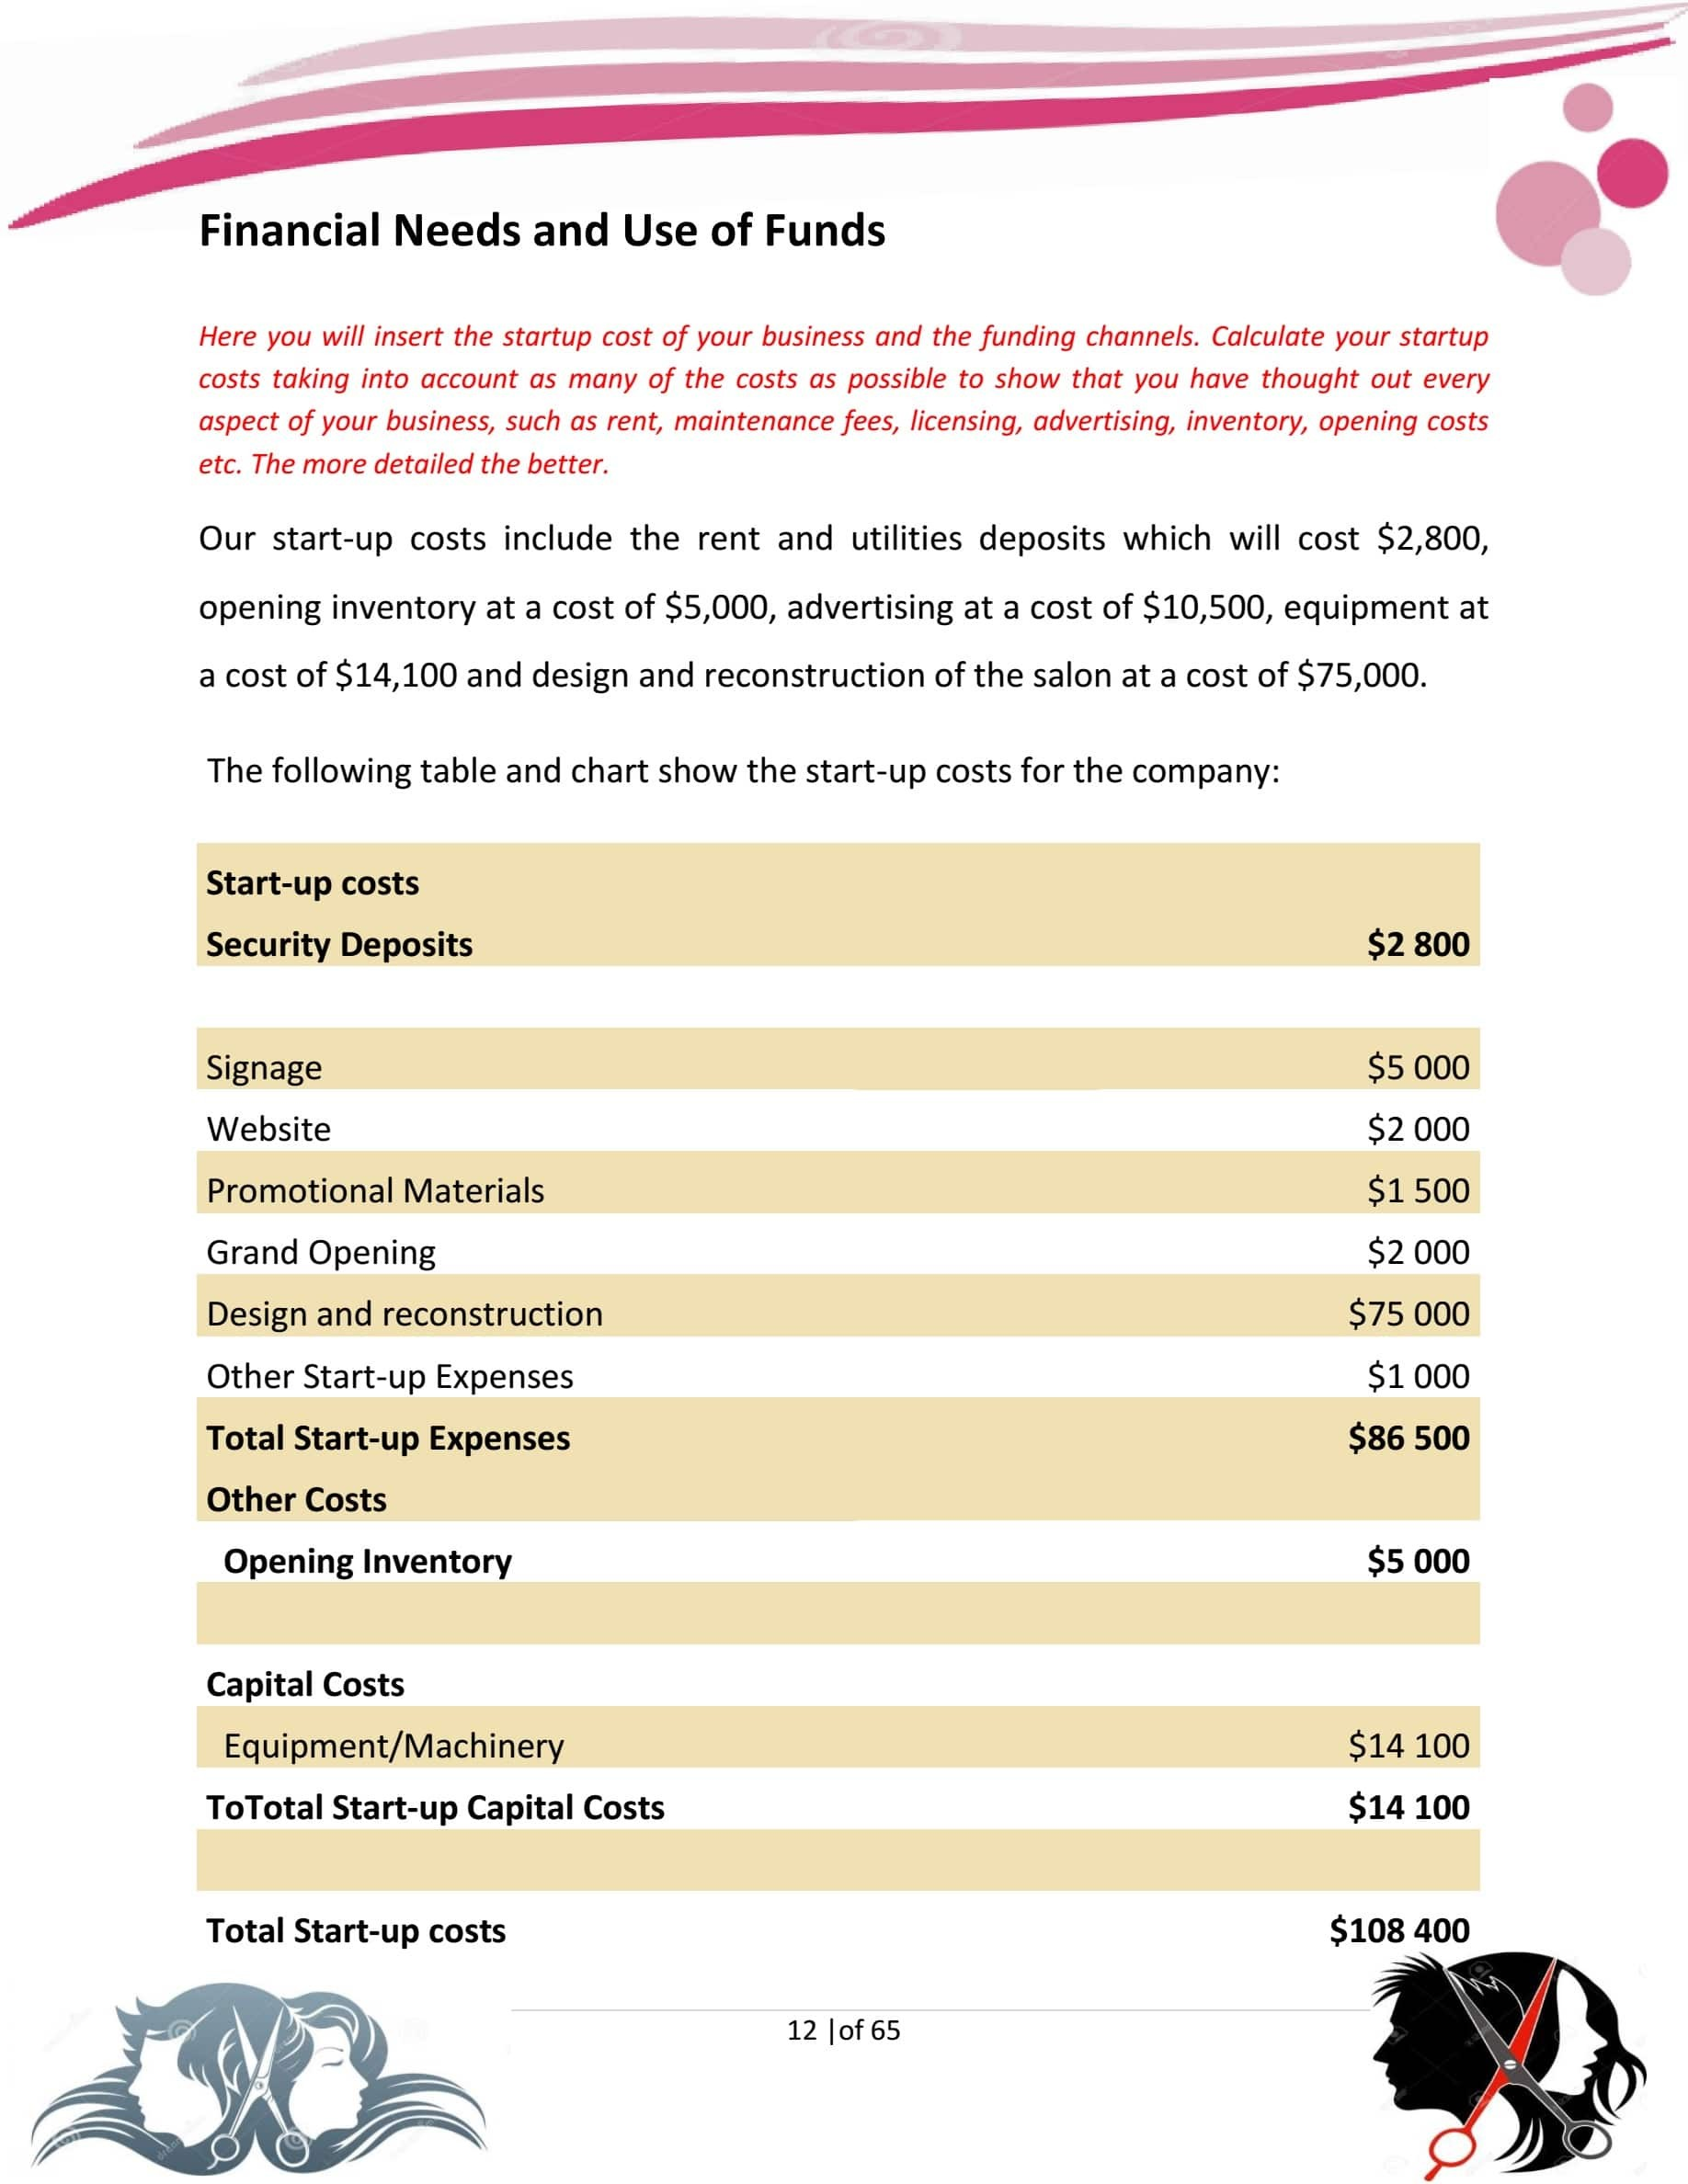 hair salon business plan template  Hair Salon Business Plan Template Sample Pages - Black Box ..